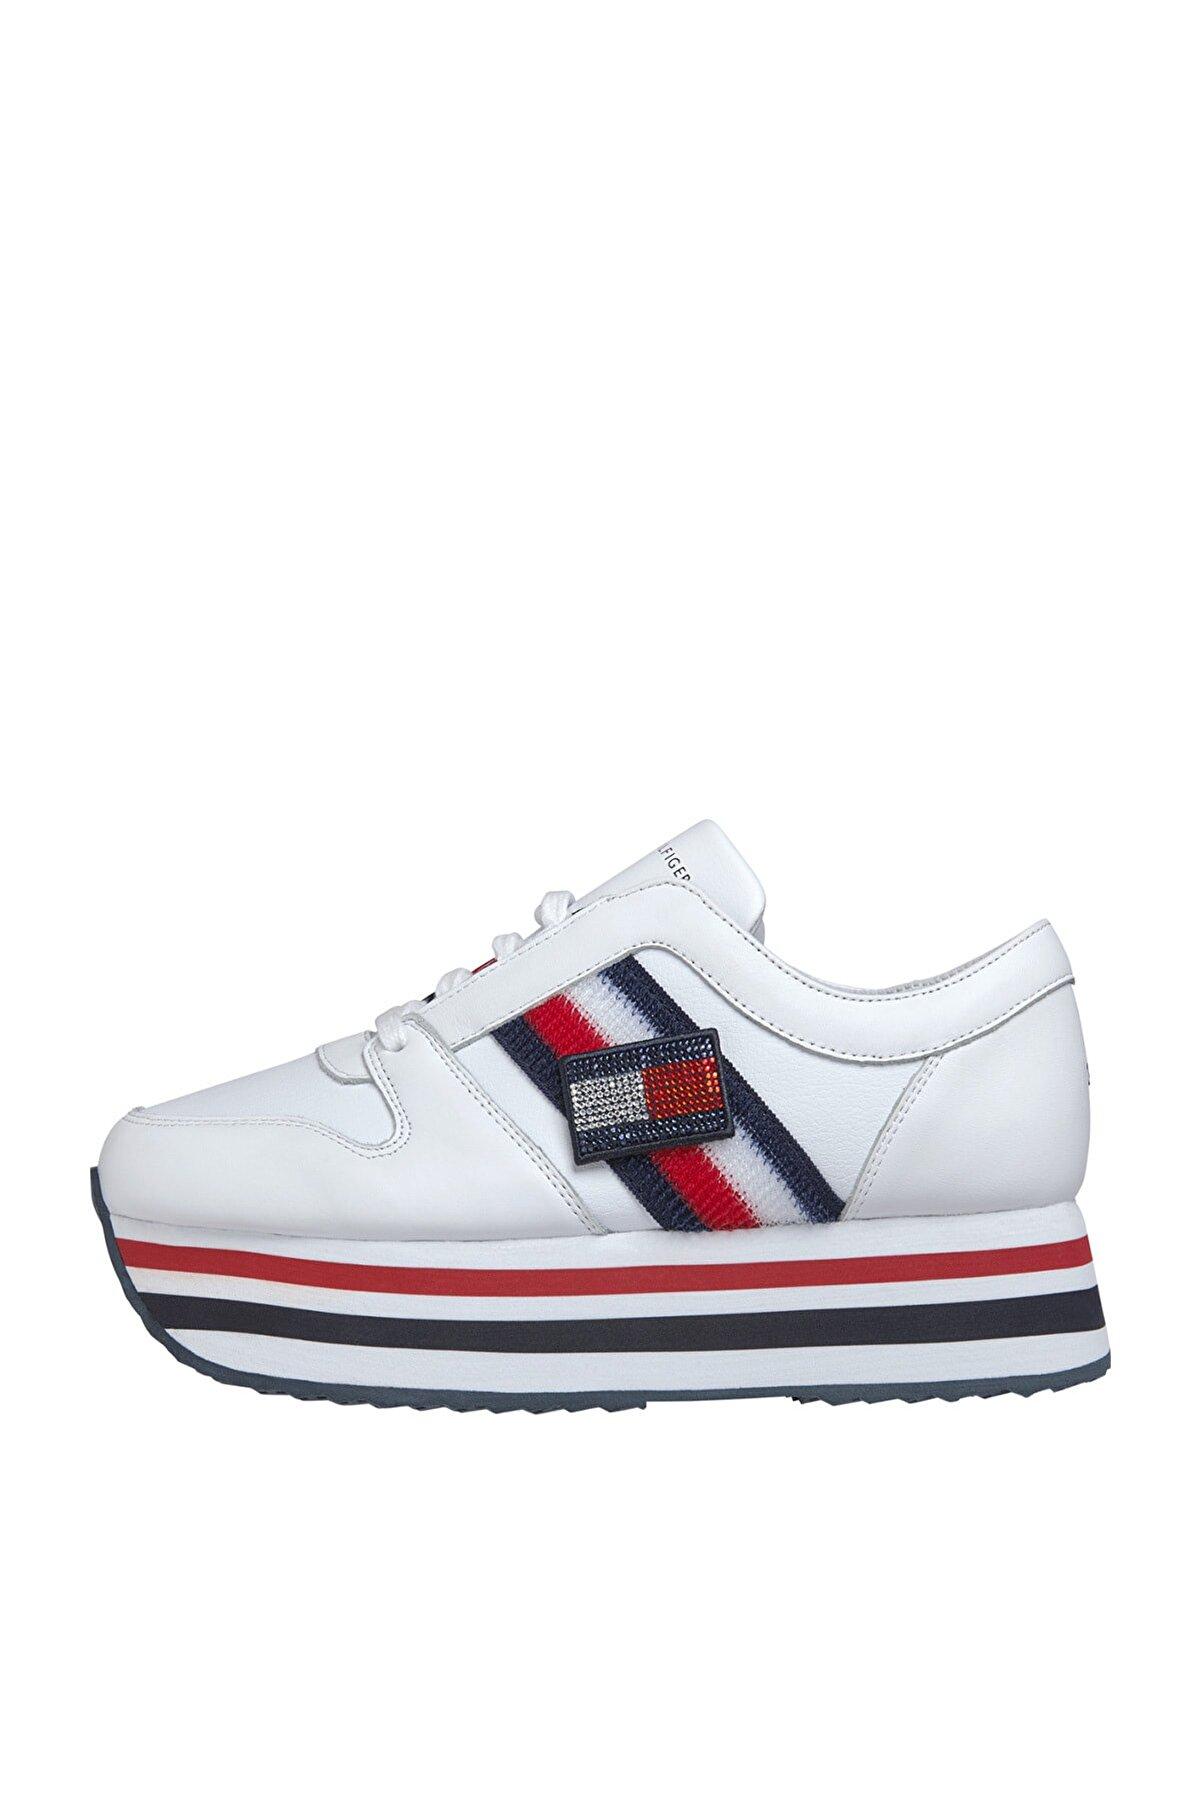 Tommy Hilfiger Kadın Customize Flatform Sneaker FW0FW04595